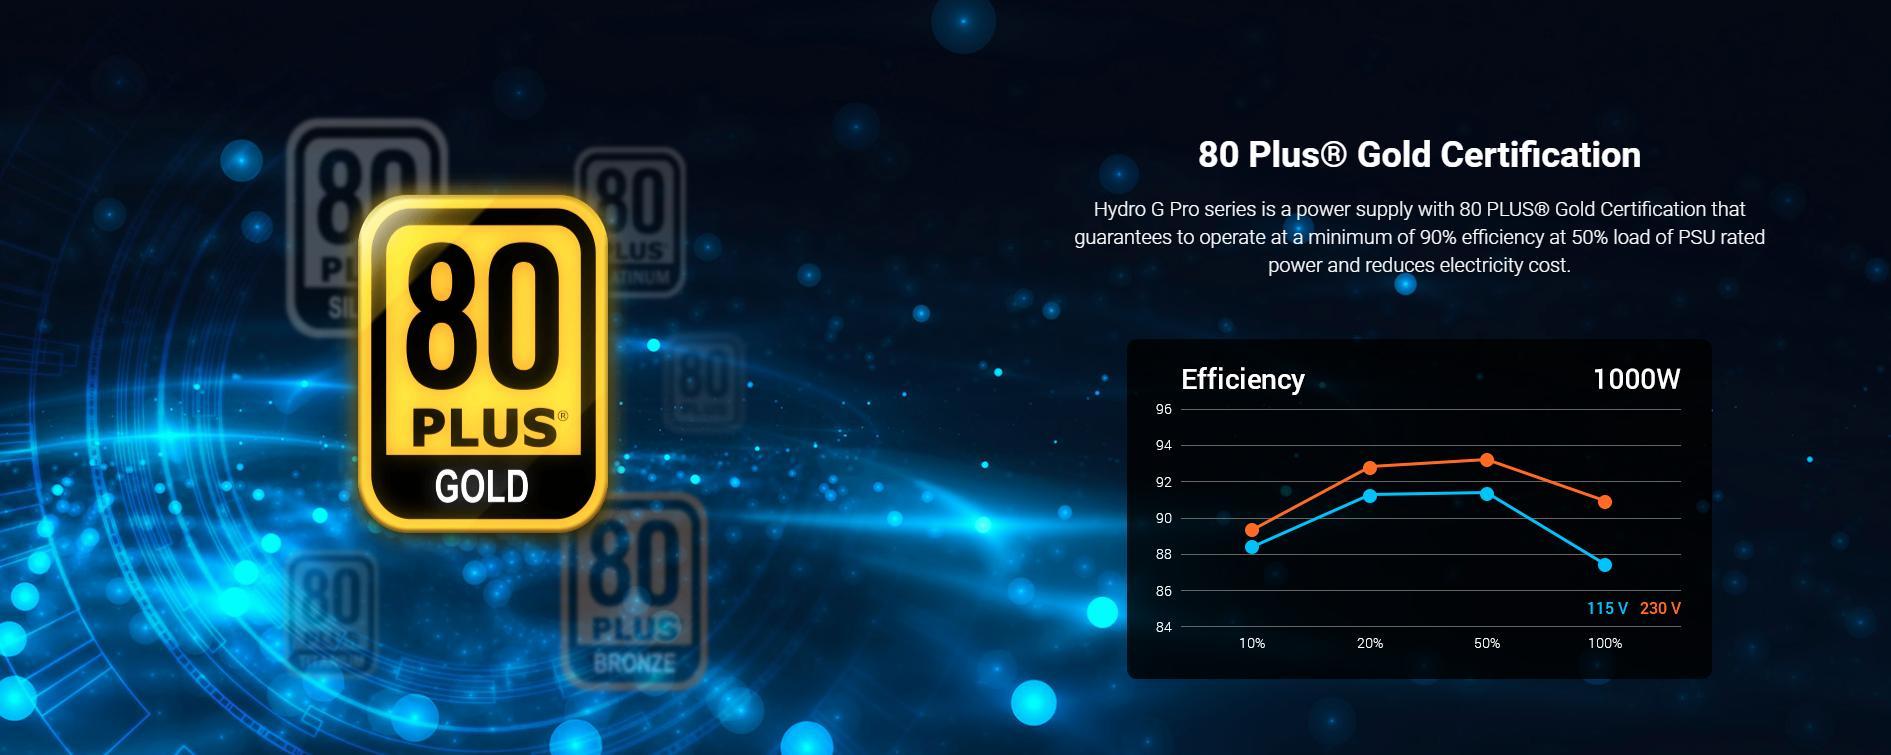 FSP Power Supply HYDRO G PRO Series Model HG2-1000 - Active PFC - 80 Plus Gold - Full Modular giới thiệu 3